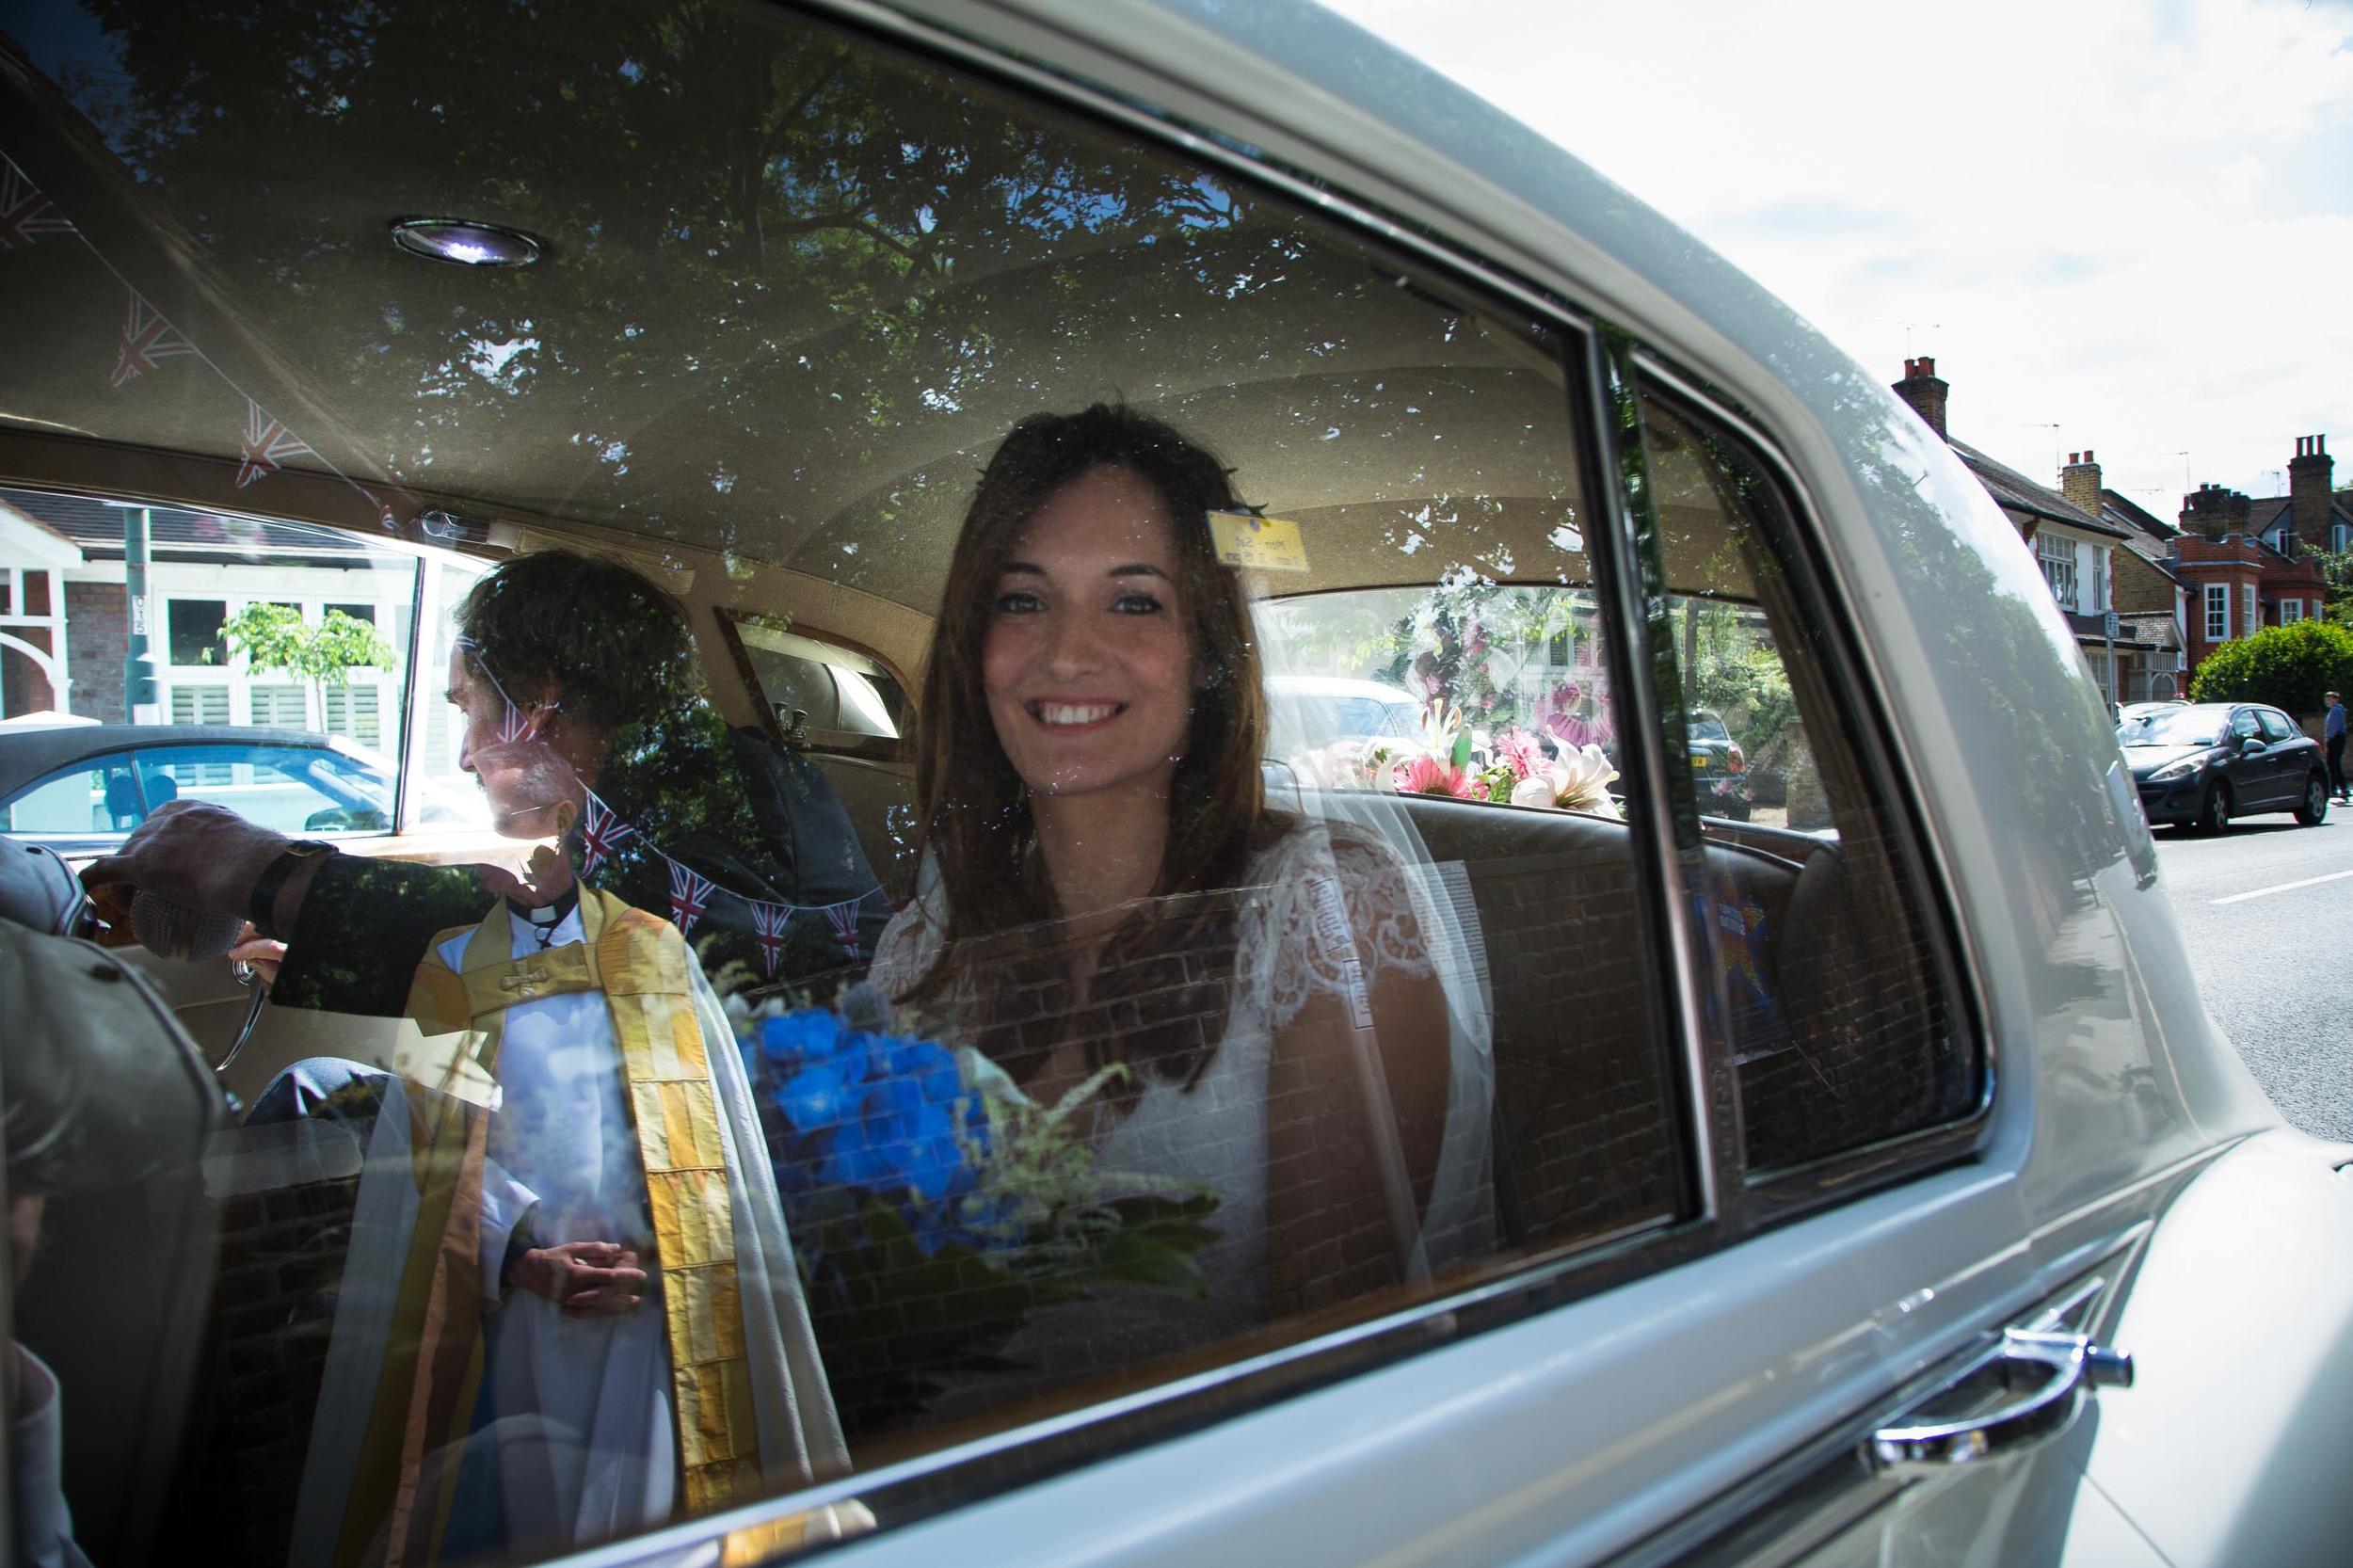 barnes-wedding-adam-rowley-photographer-rolls-royce